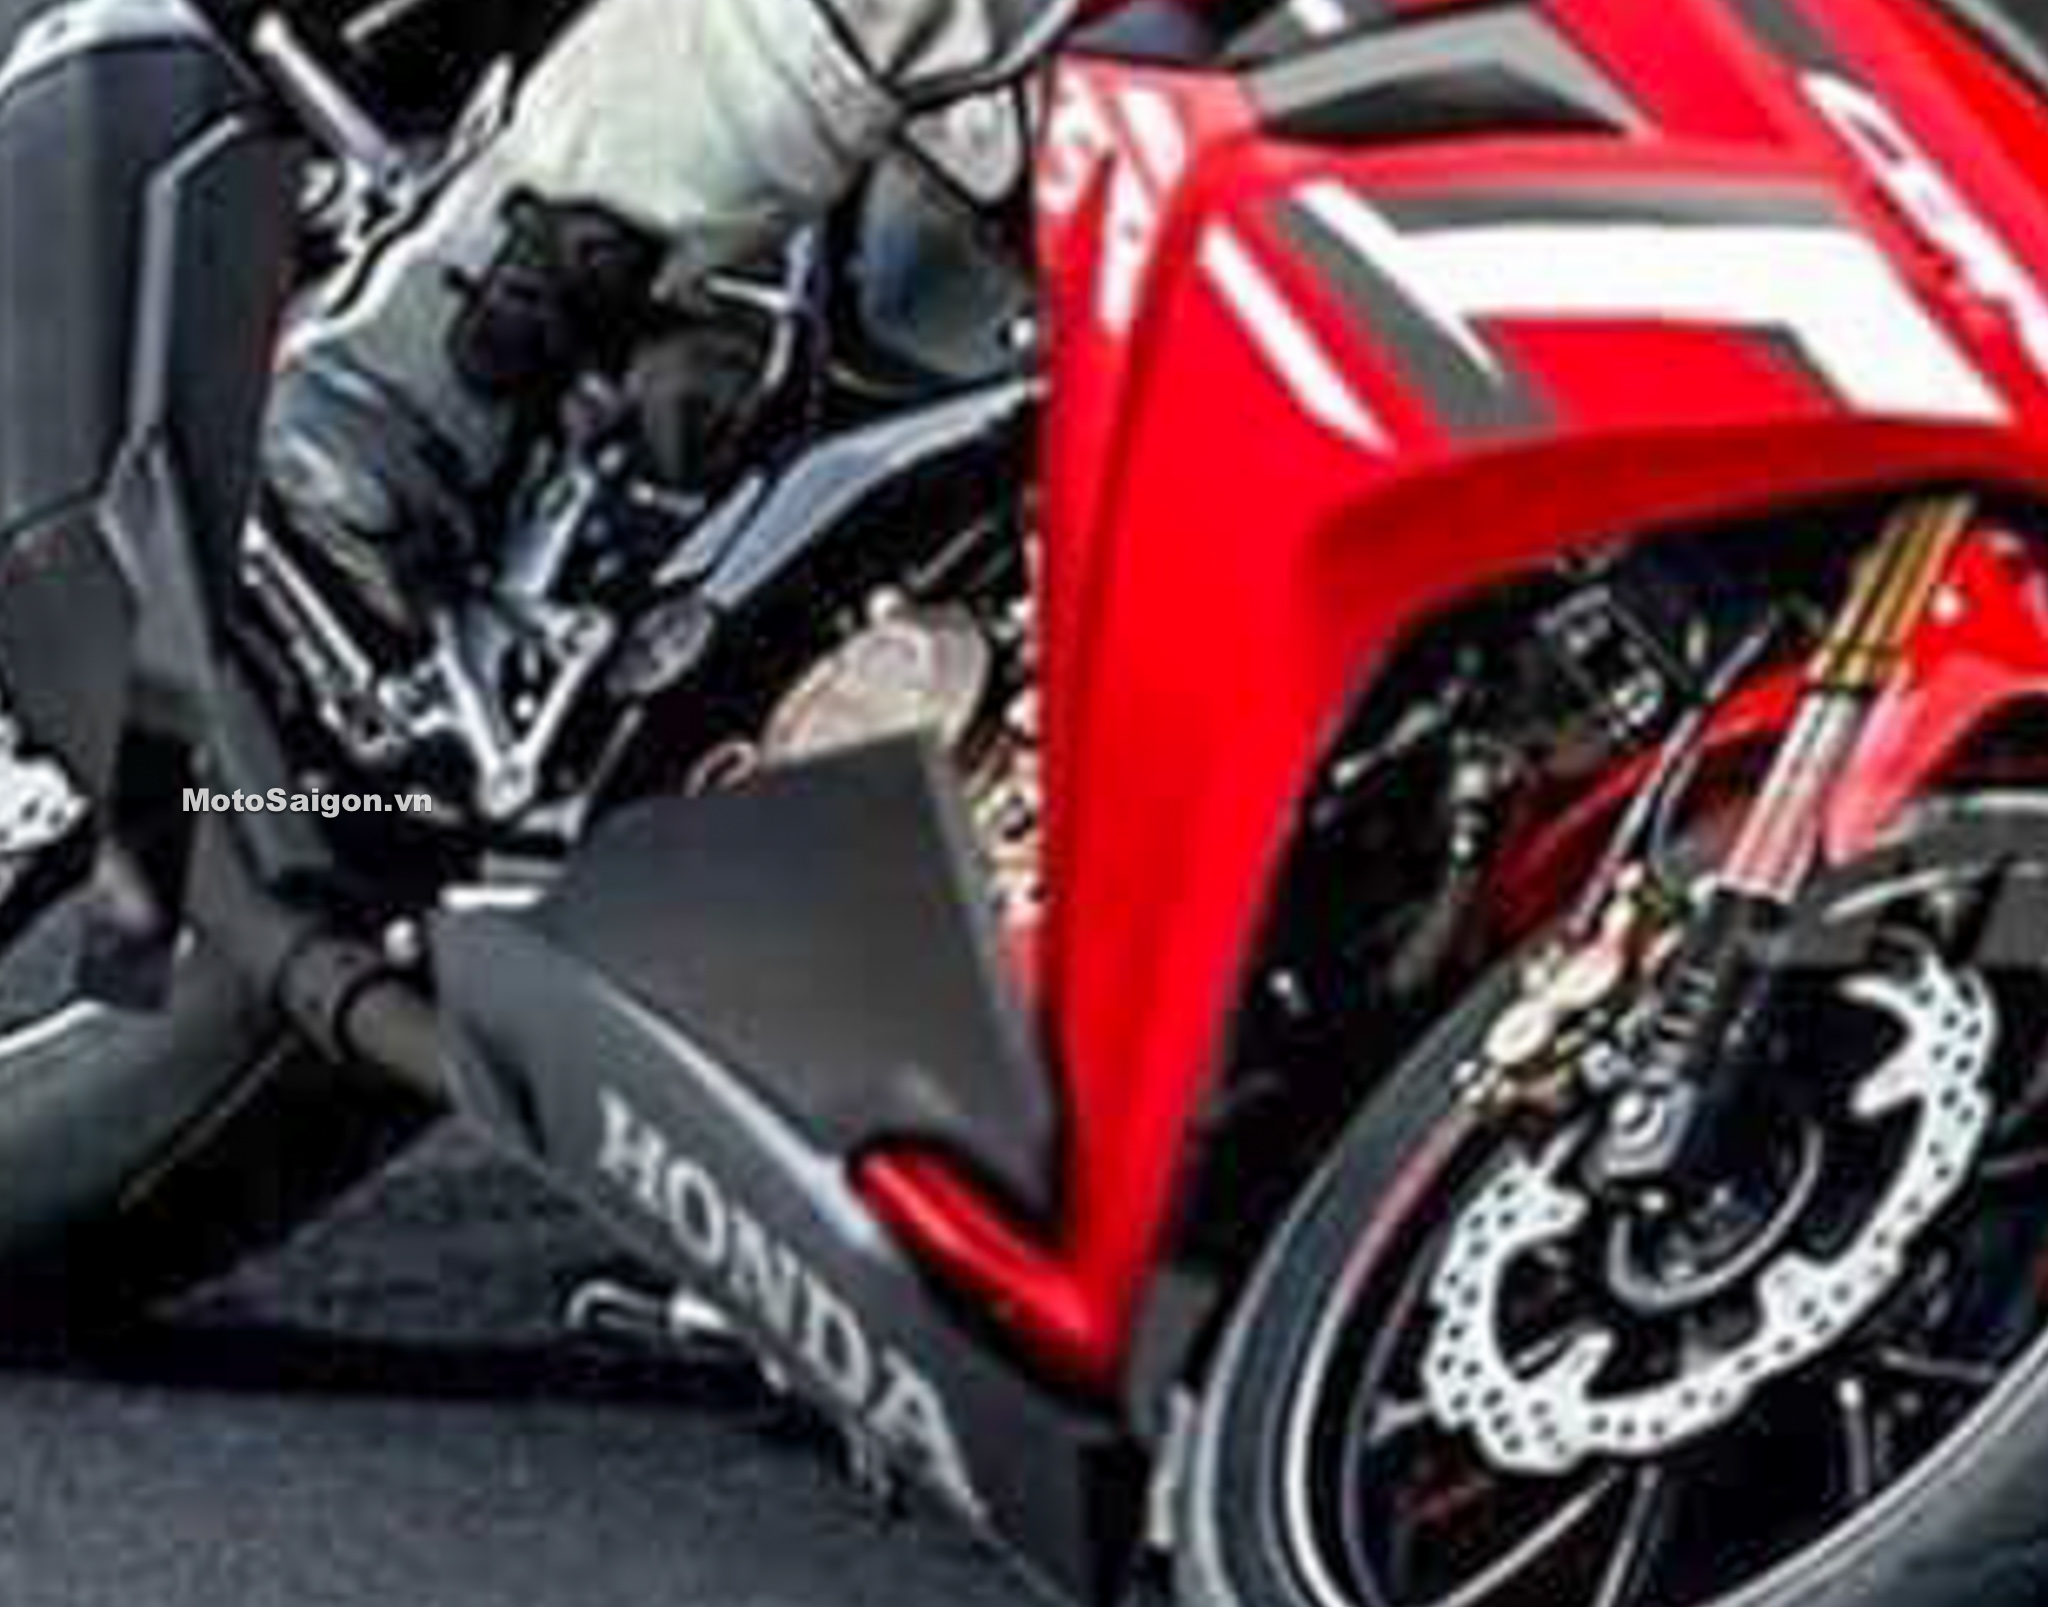 Honda CBR150R 2021 có ABS giống CBR250RR sẽ khiến R15 v3 lép vế?